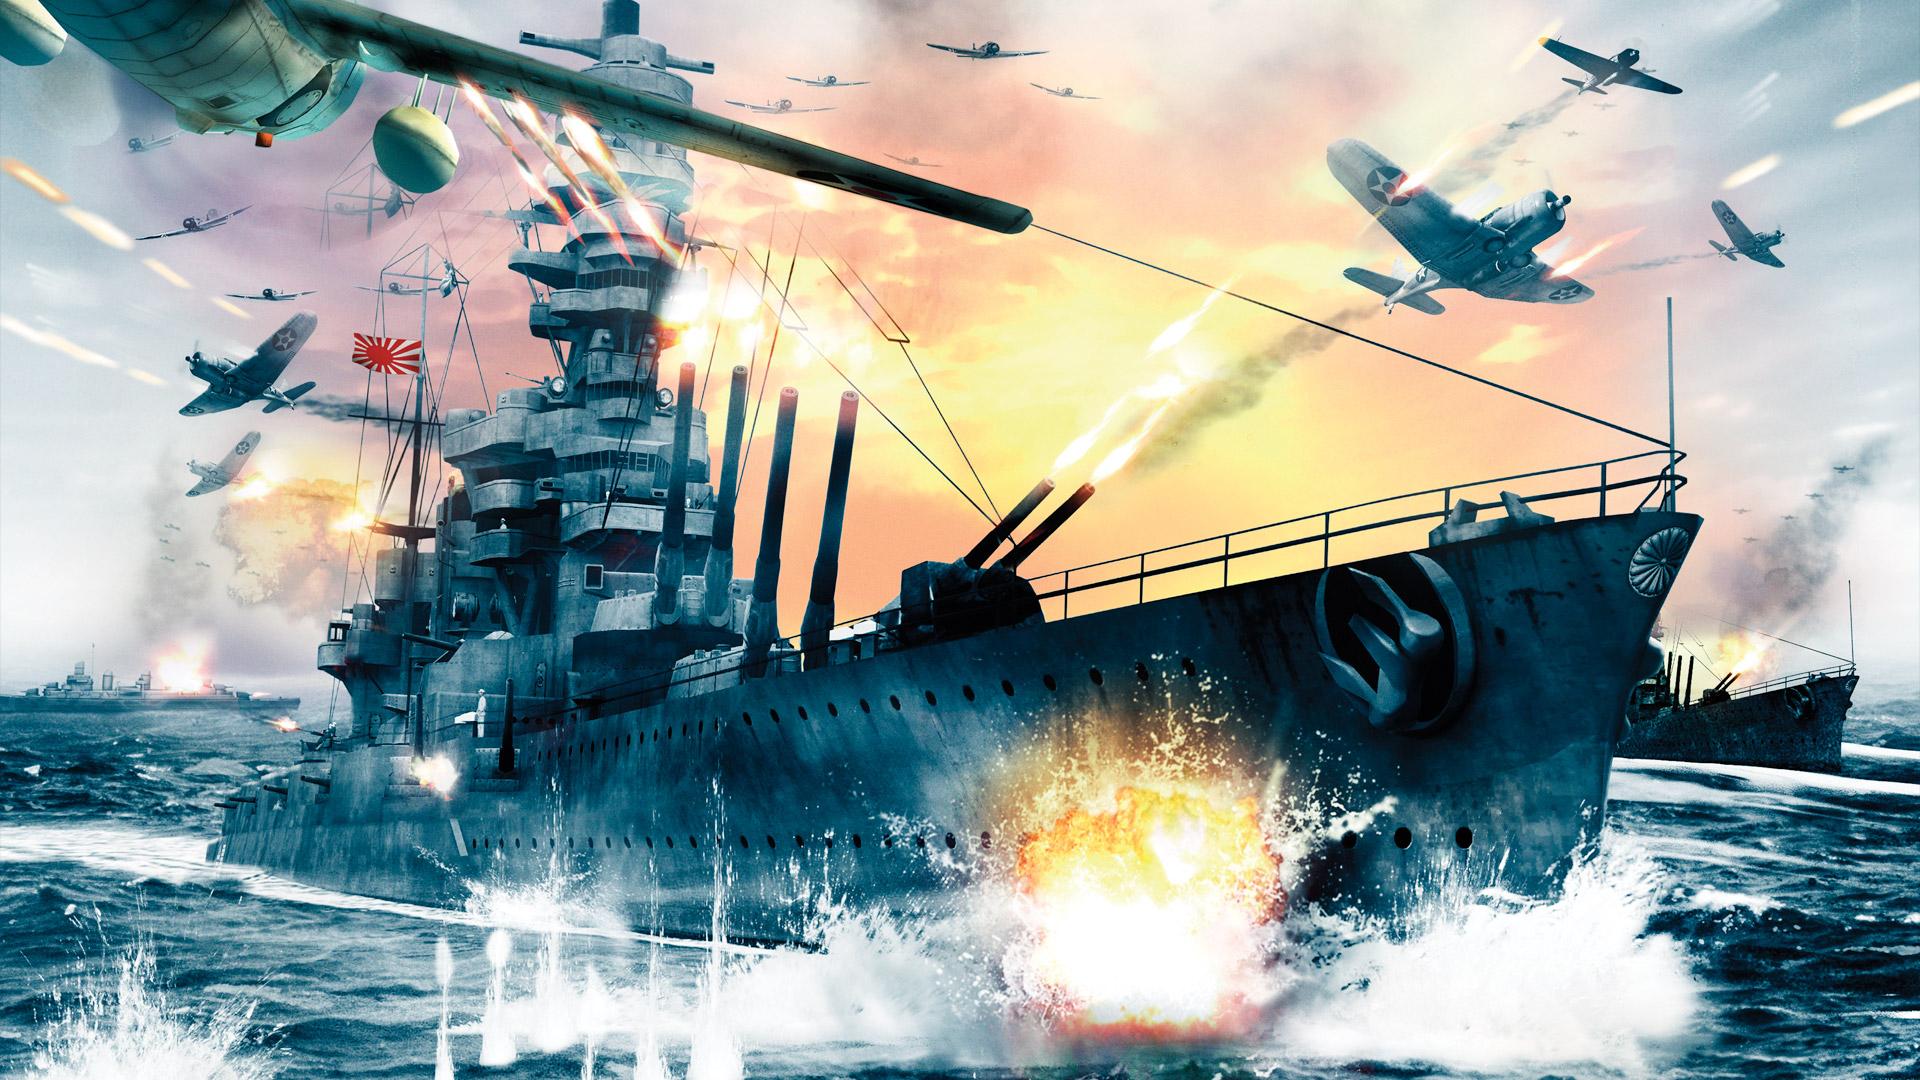 Battlestations Midway wallpaper 1